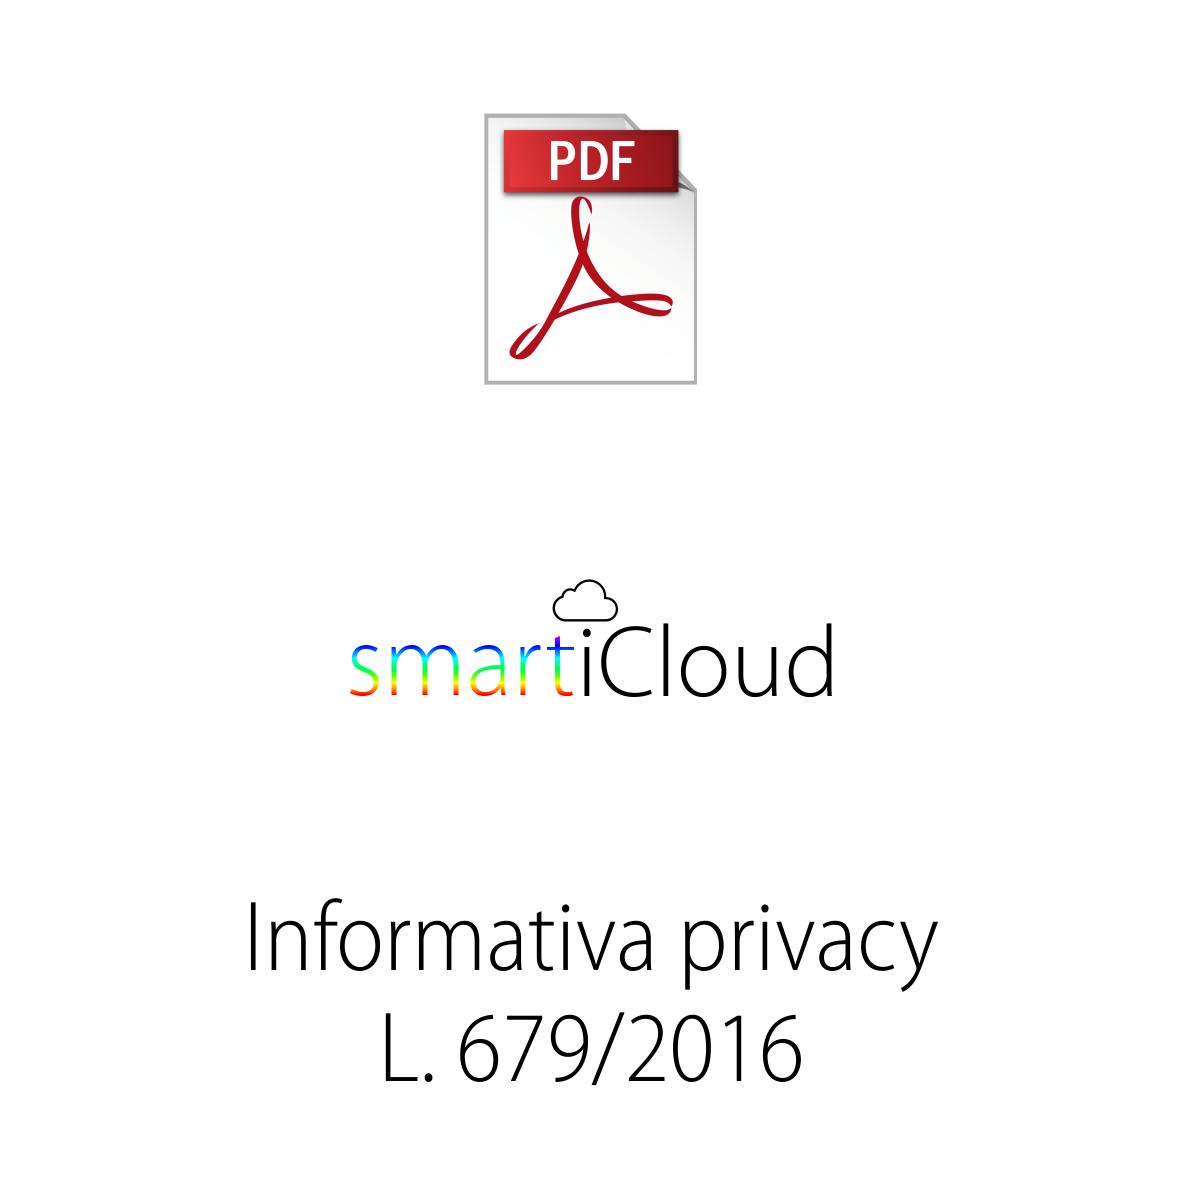 promelit - pdf 11.png